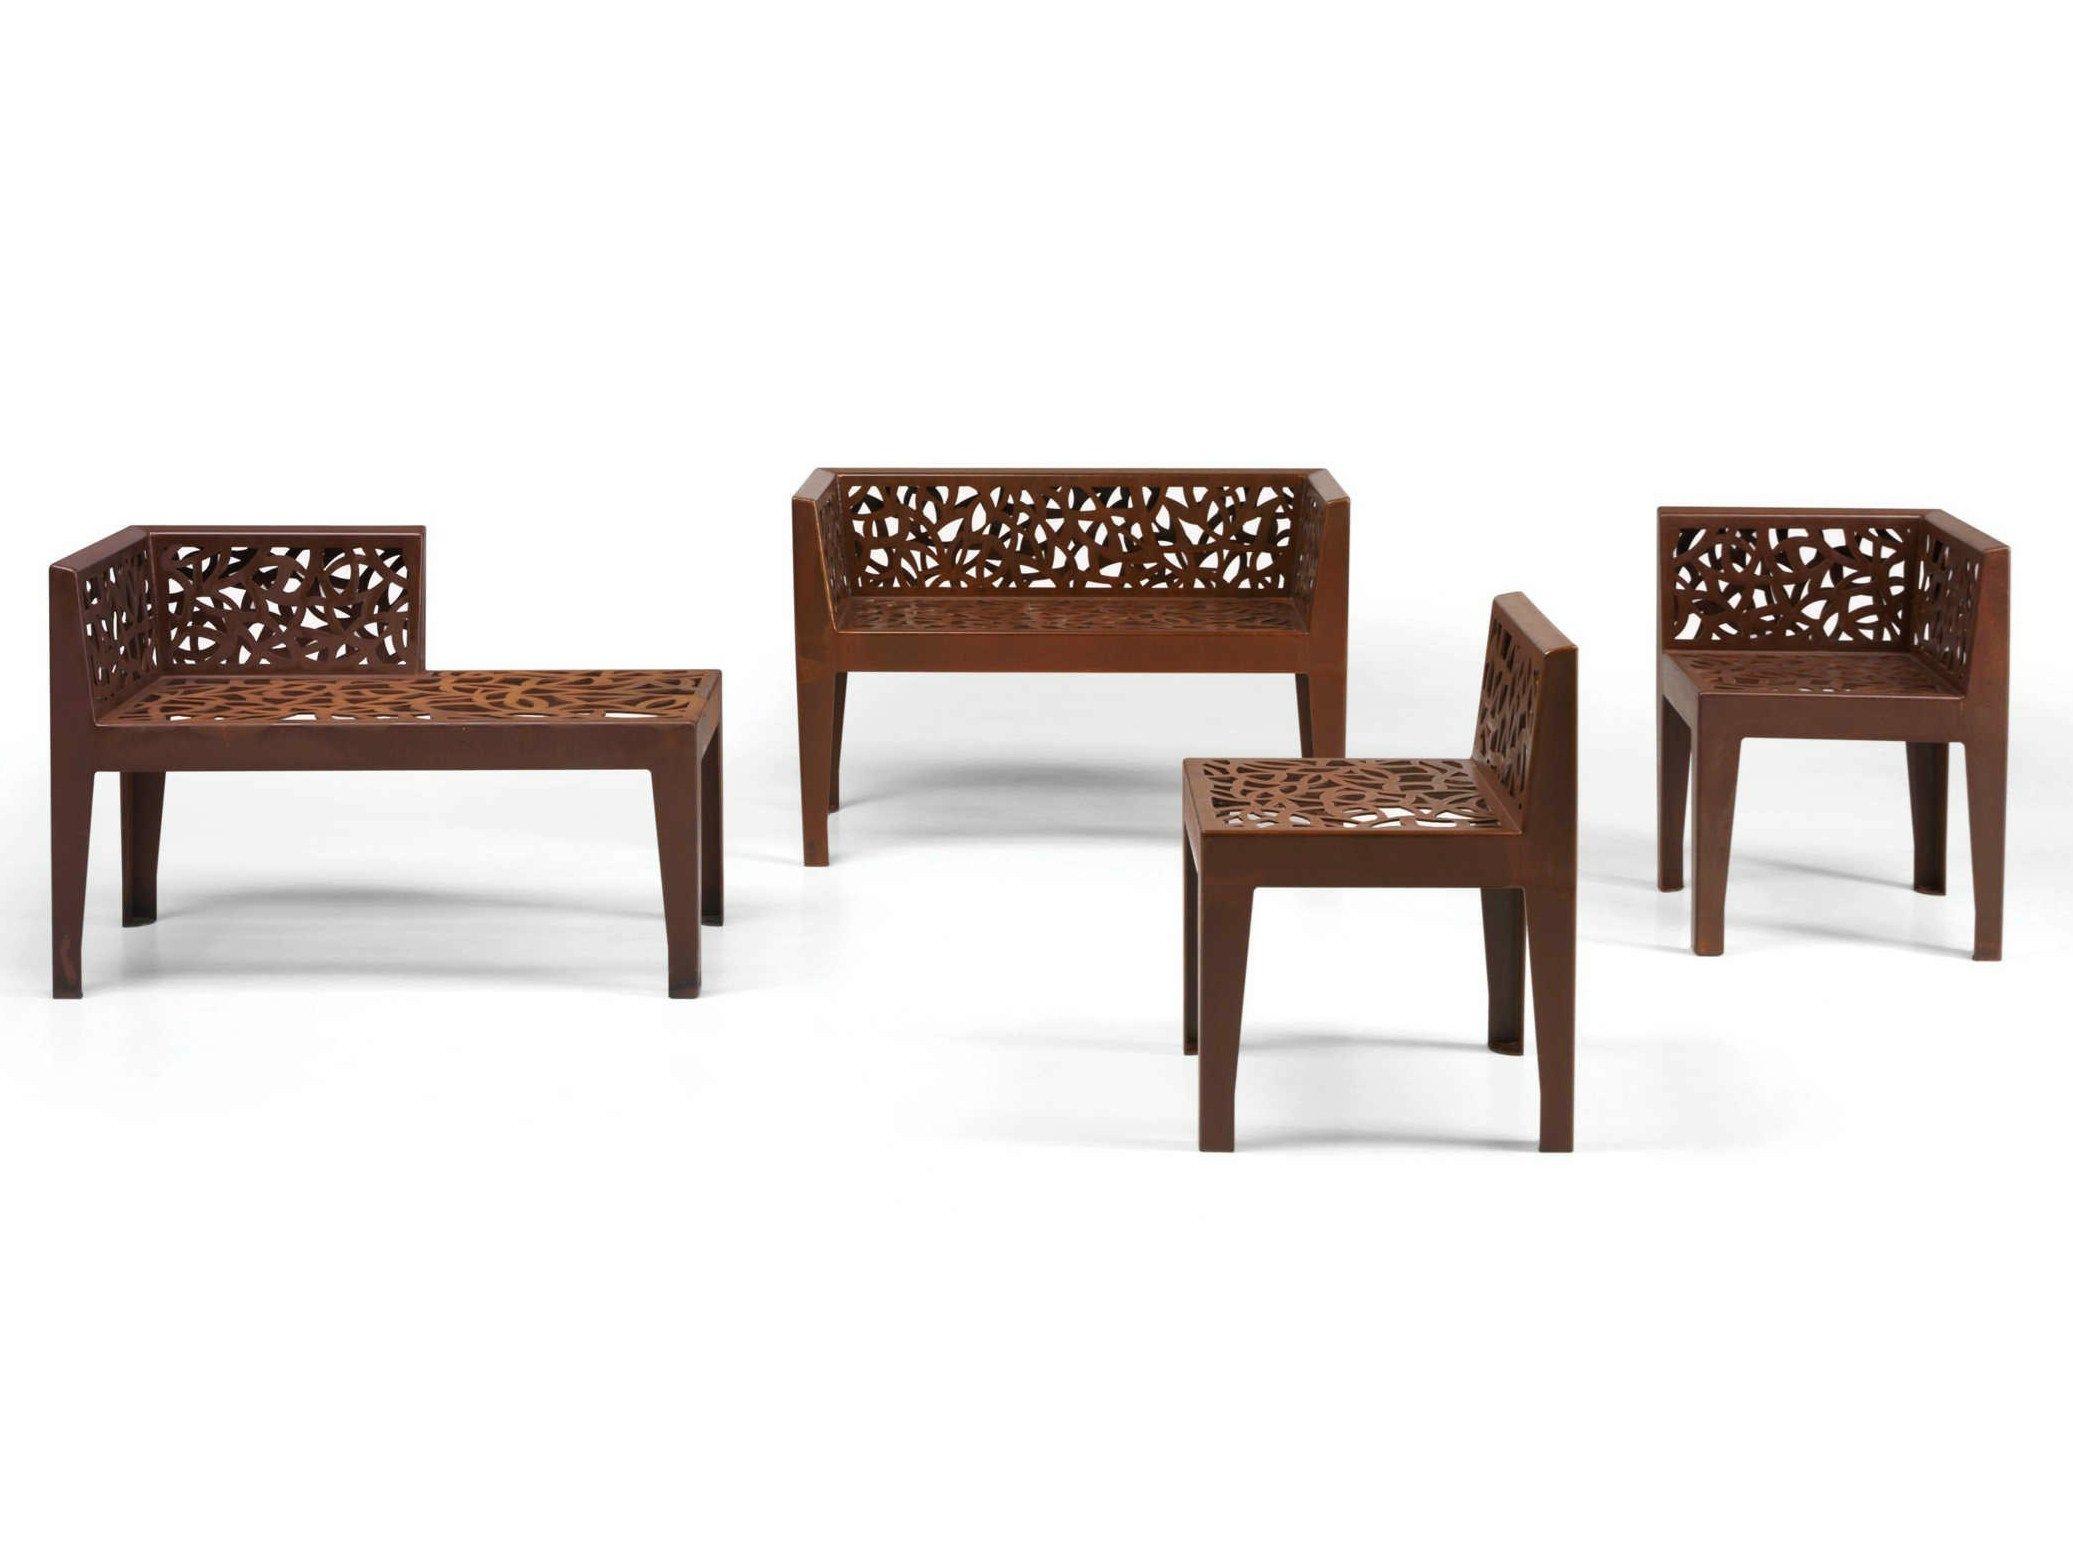 Corten™ garden chair Color Corten Style Collection by Metalco | design Marc Aurel